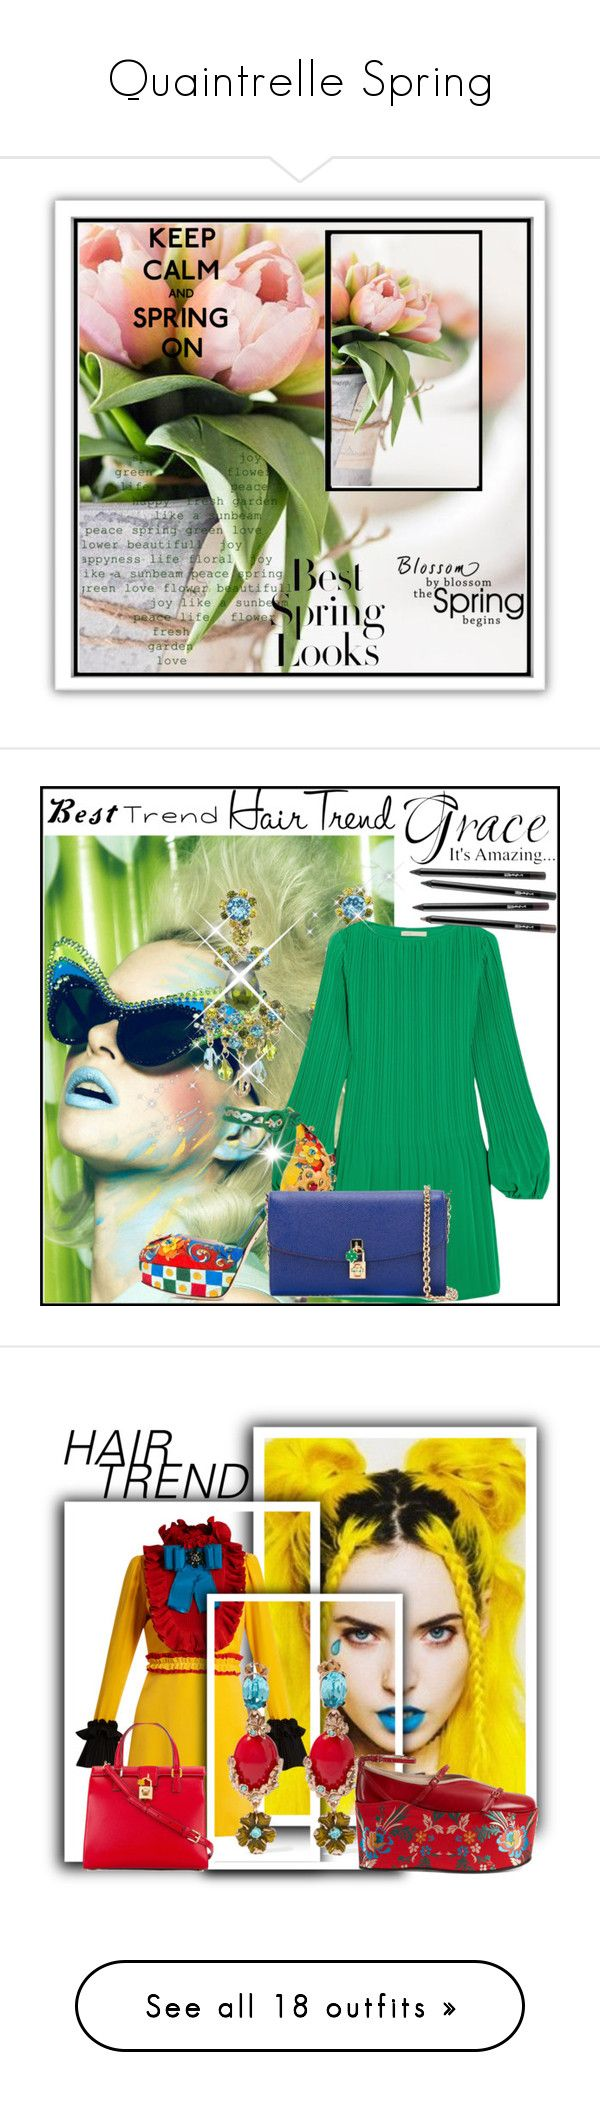 """Quaintrelle Spring"" by bibiantje-m on Polyvore featuring mode, schoonheid, hairtrend, rainbowhair, Valentino, Nivea, H&M, By Lassen, Élitis en Bobbi Brown Cosmetics"